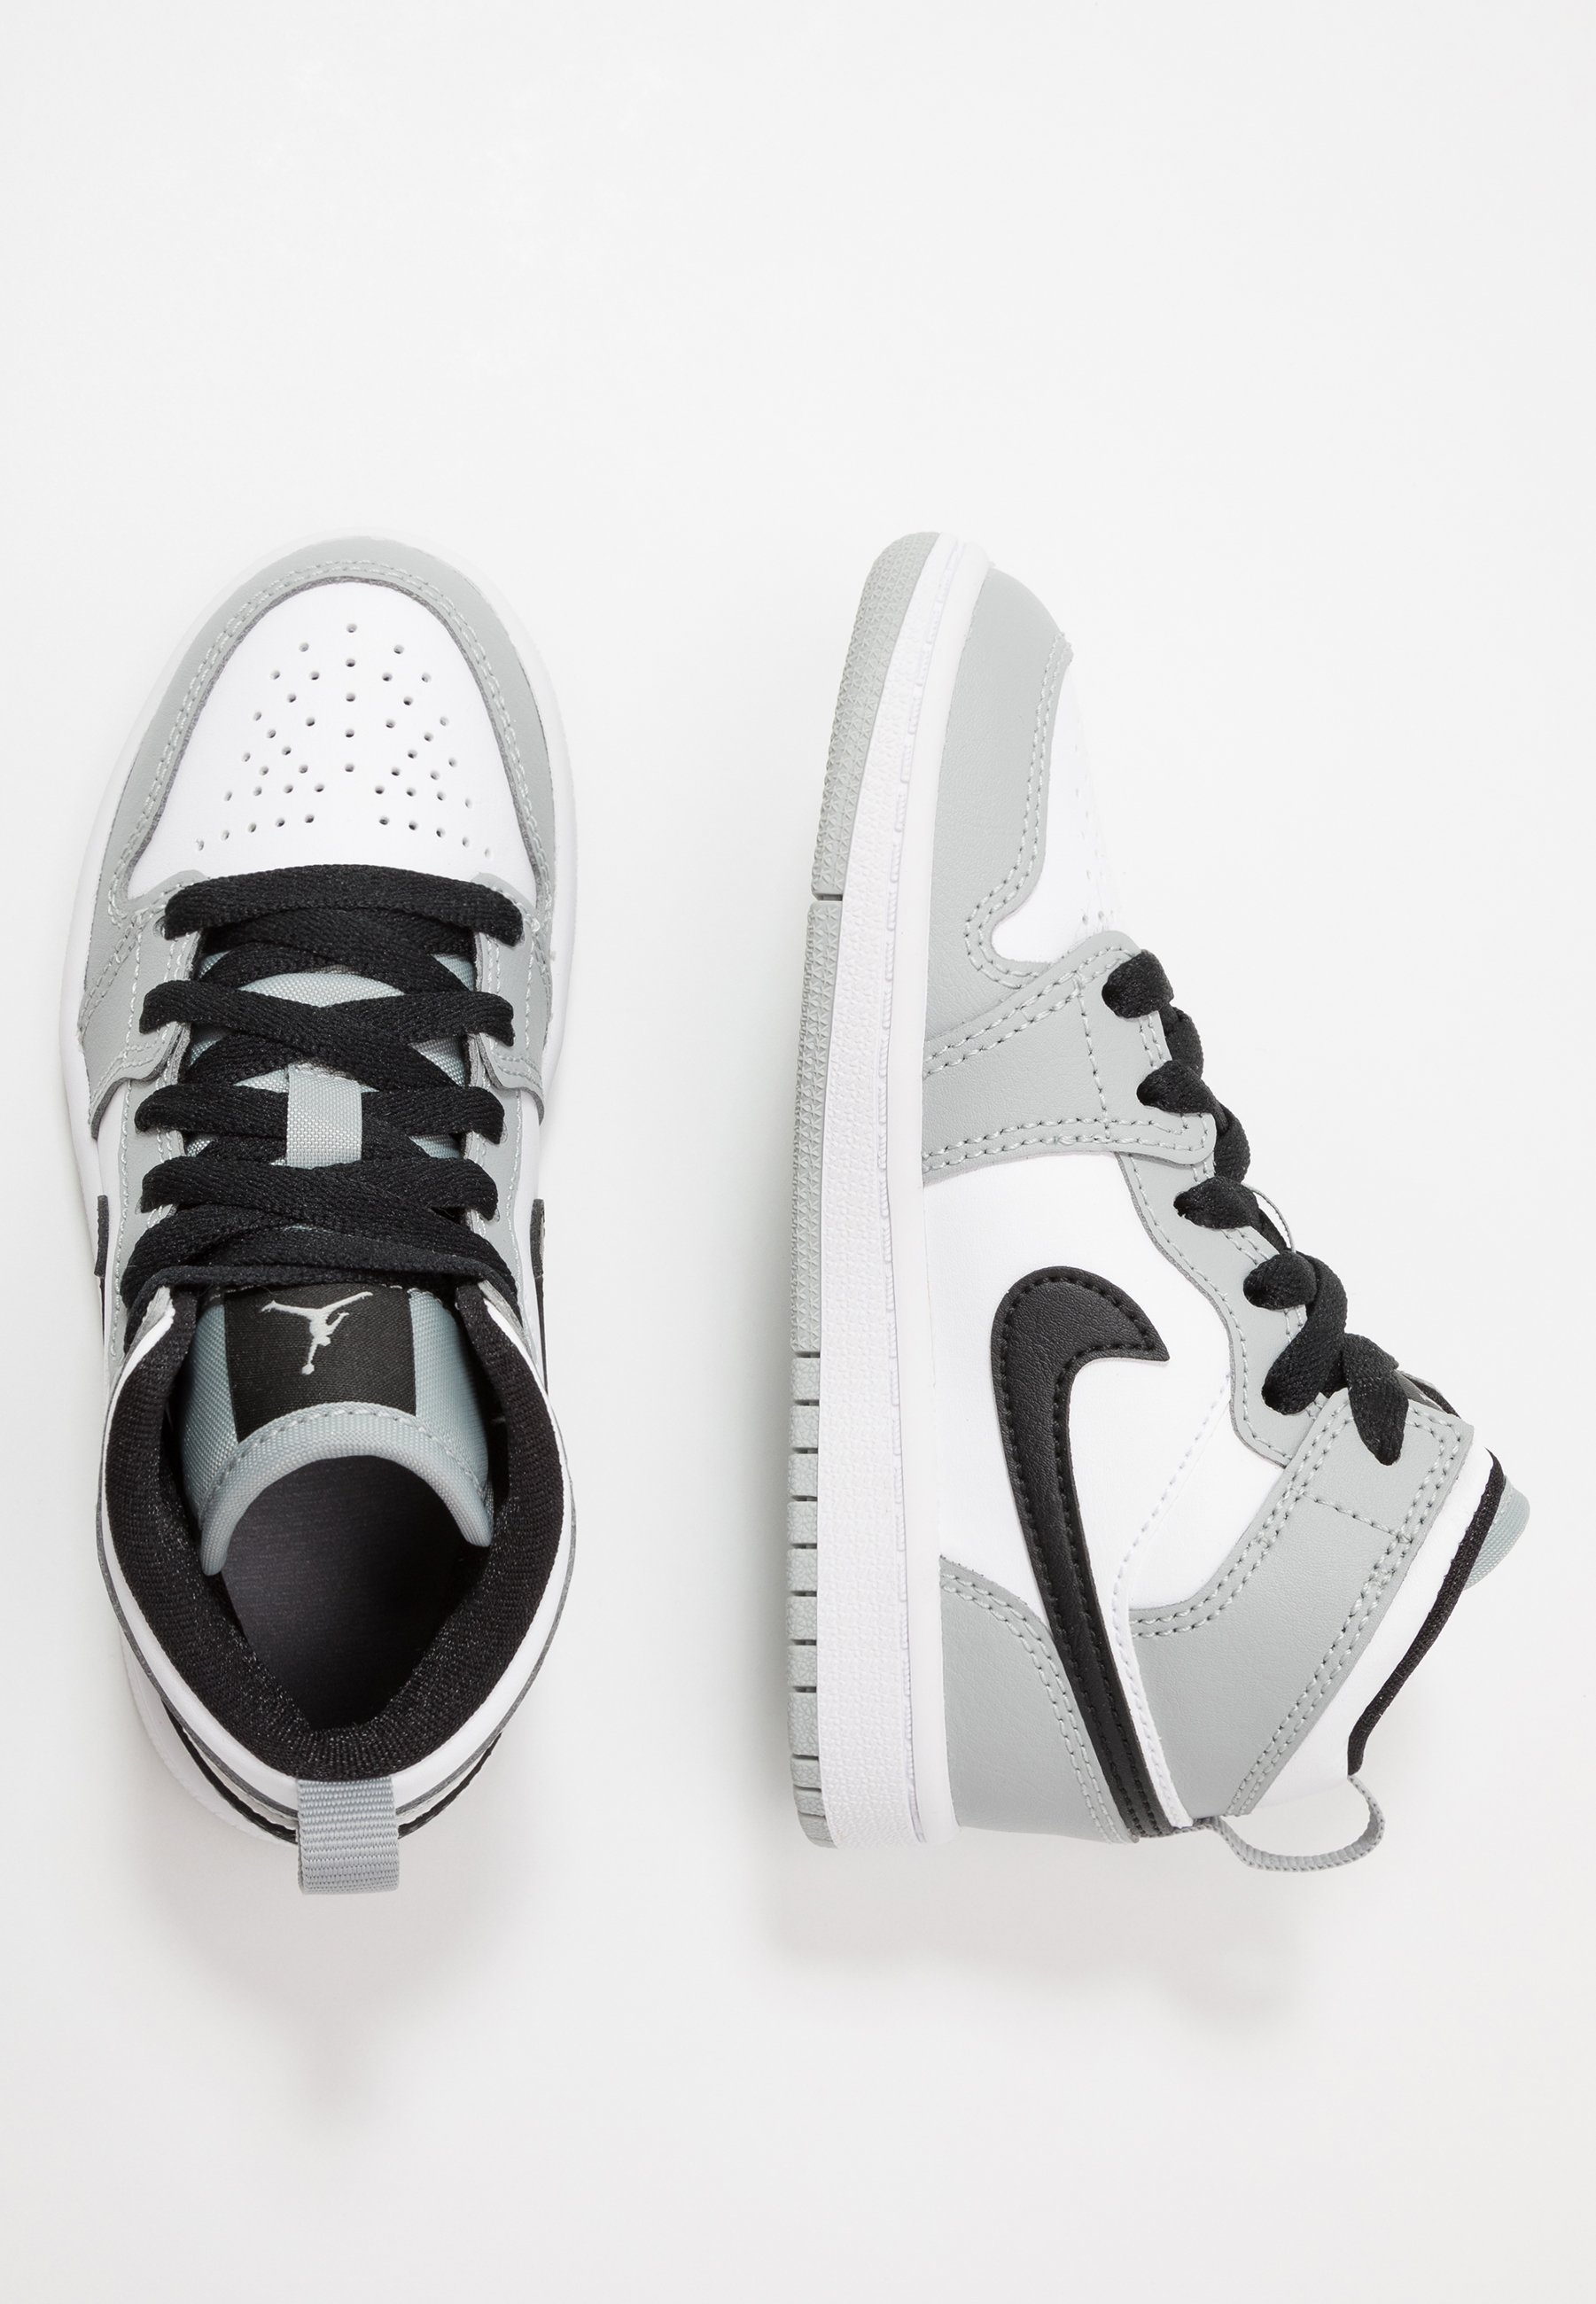 Jordan 1 MID UNISEX - Chaussures de basket - light smoke grey ...